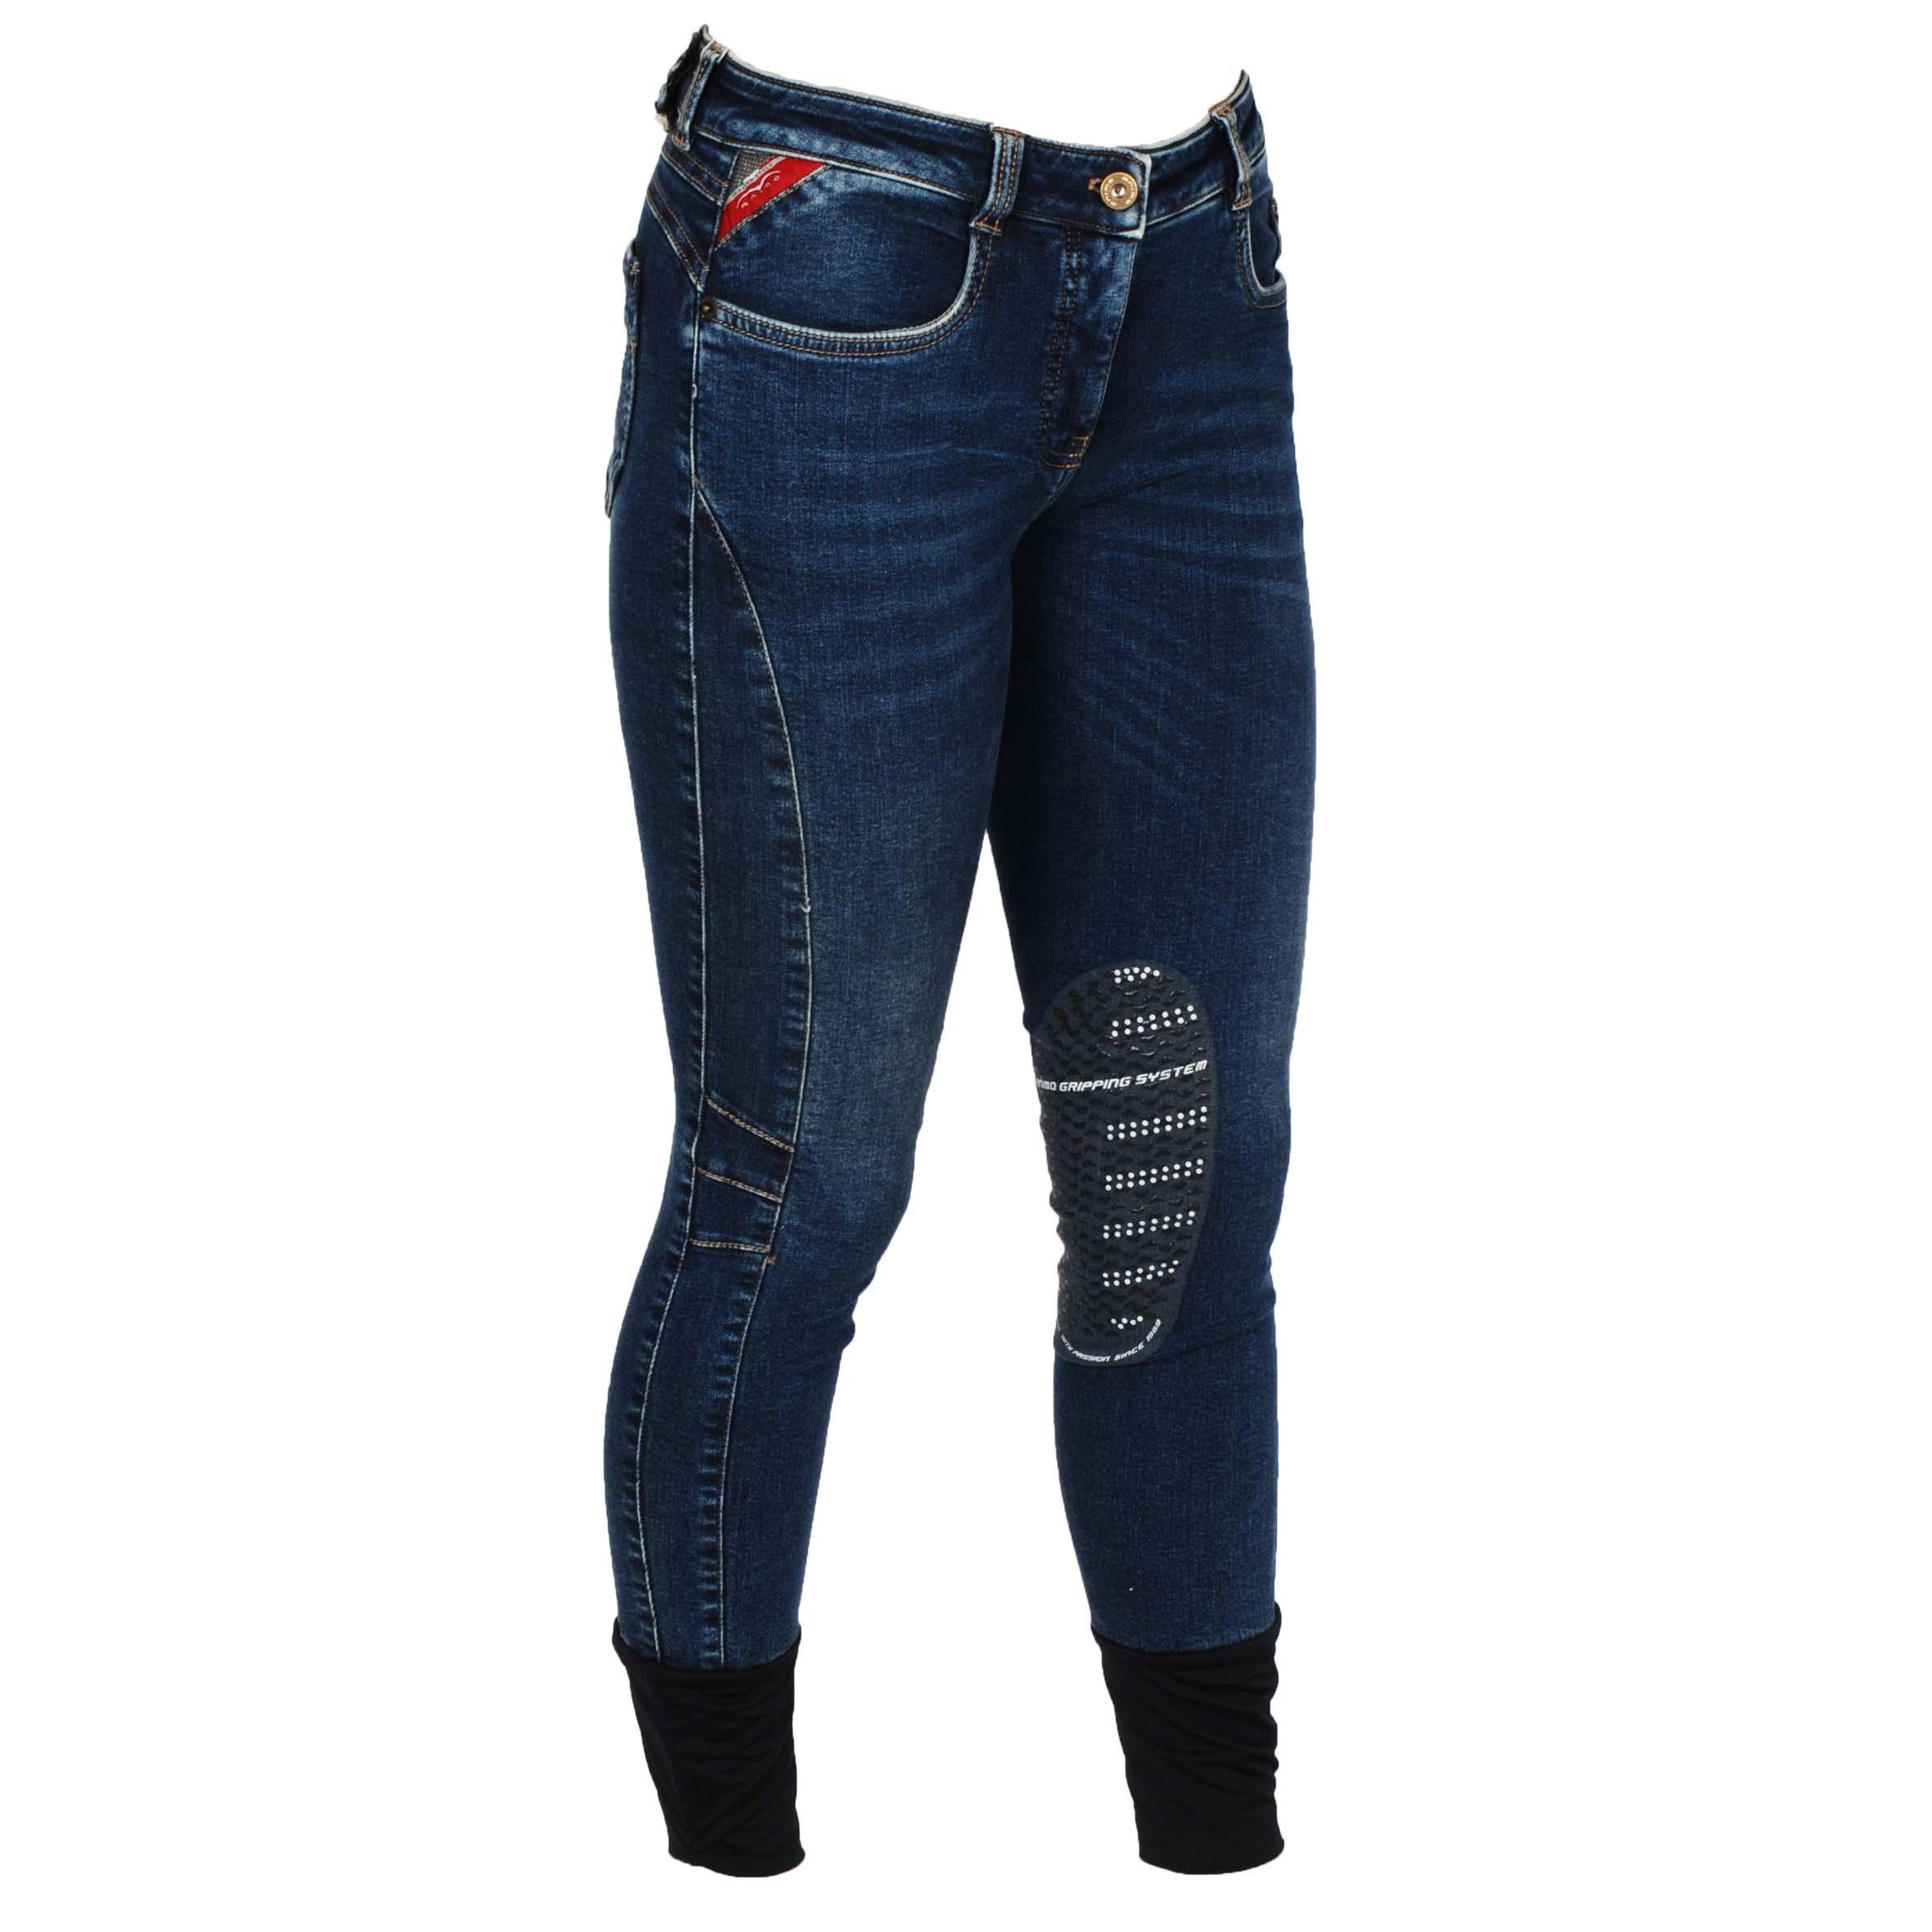 Animo Novema rijbroek jeans maat:34